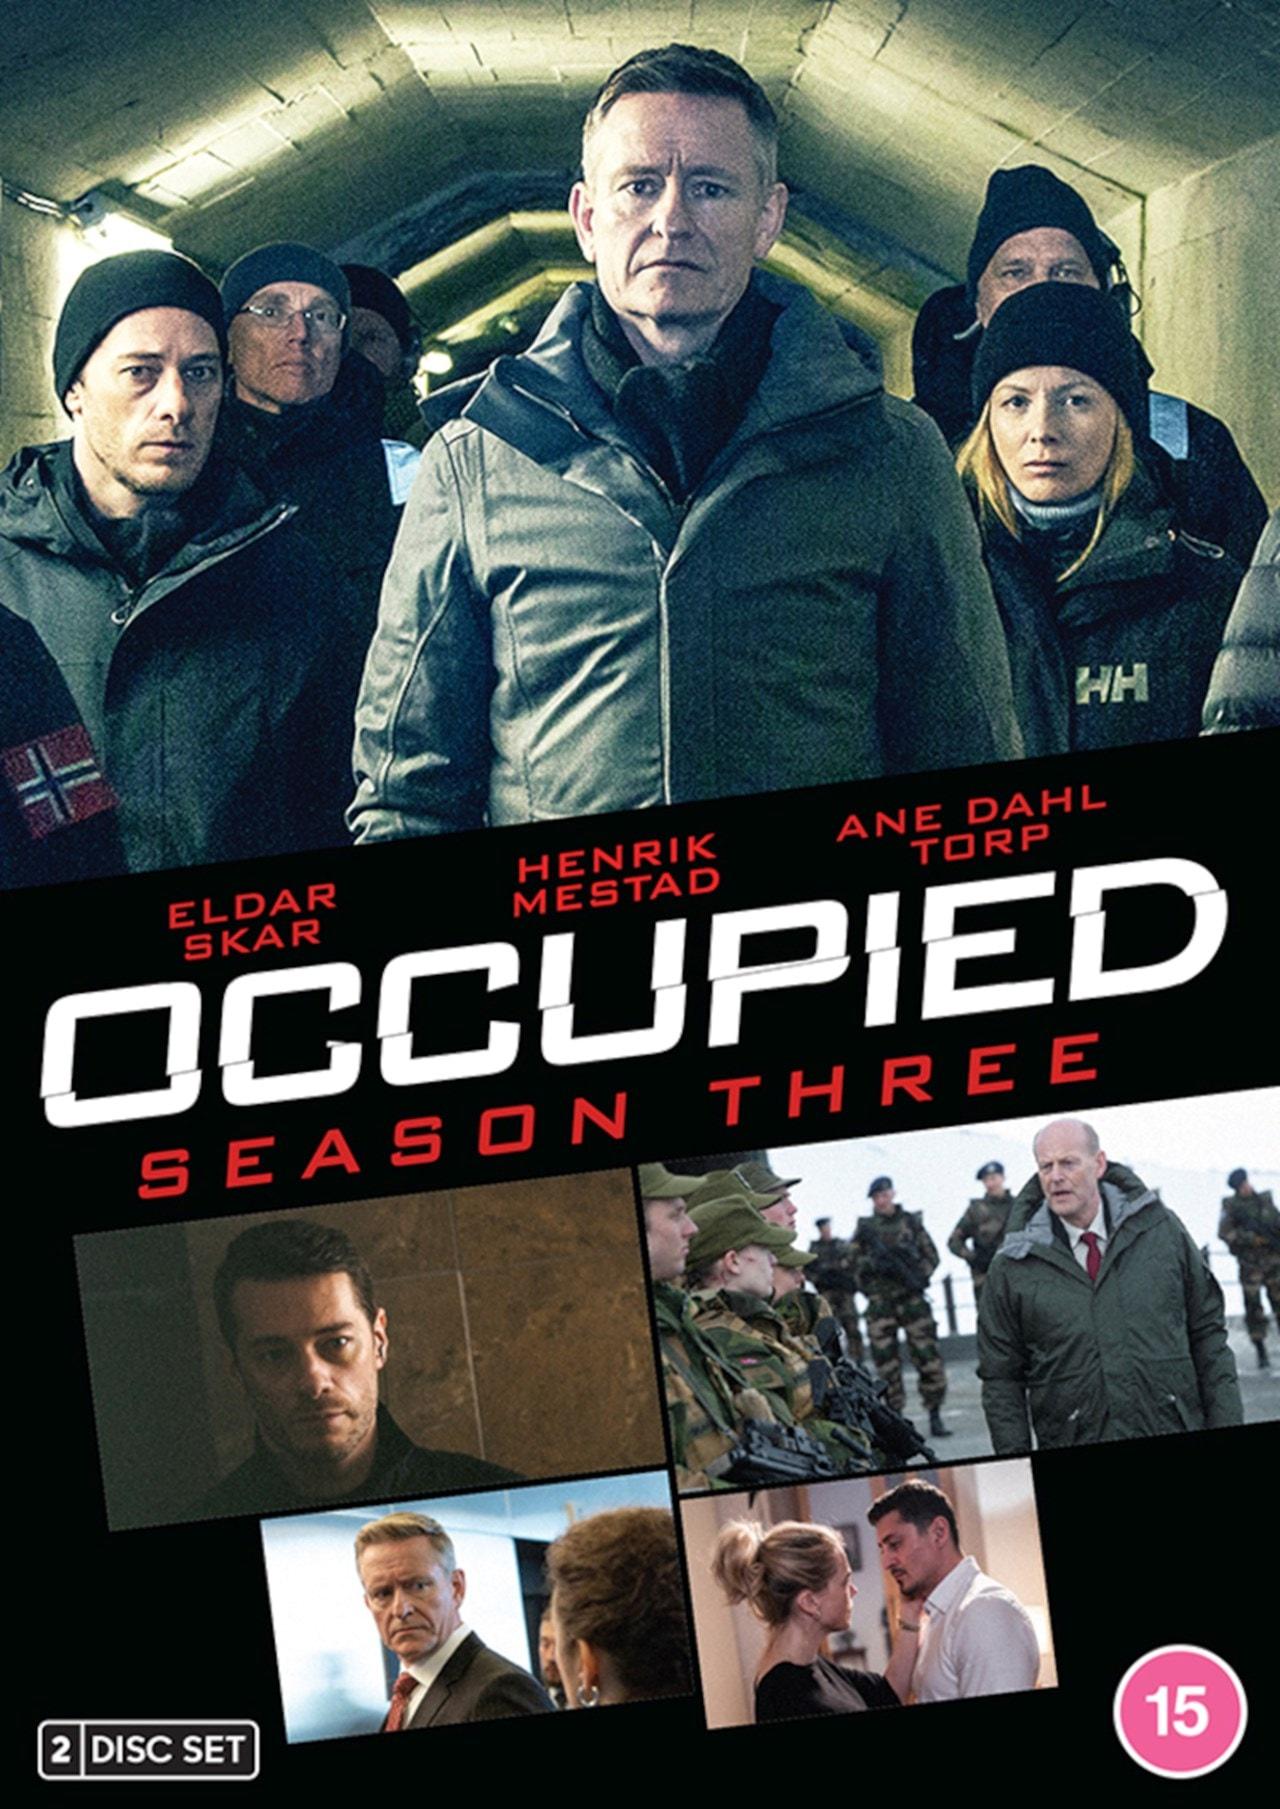 Occupied: Season 3 - 1